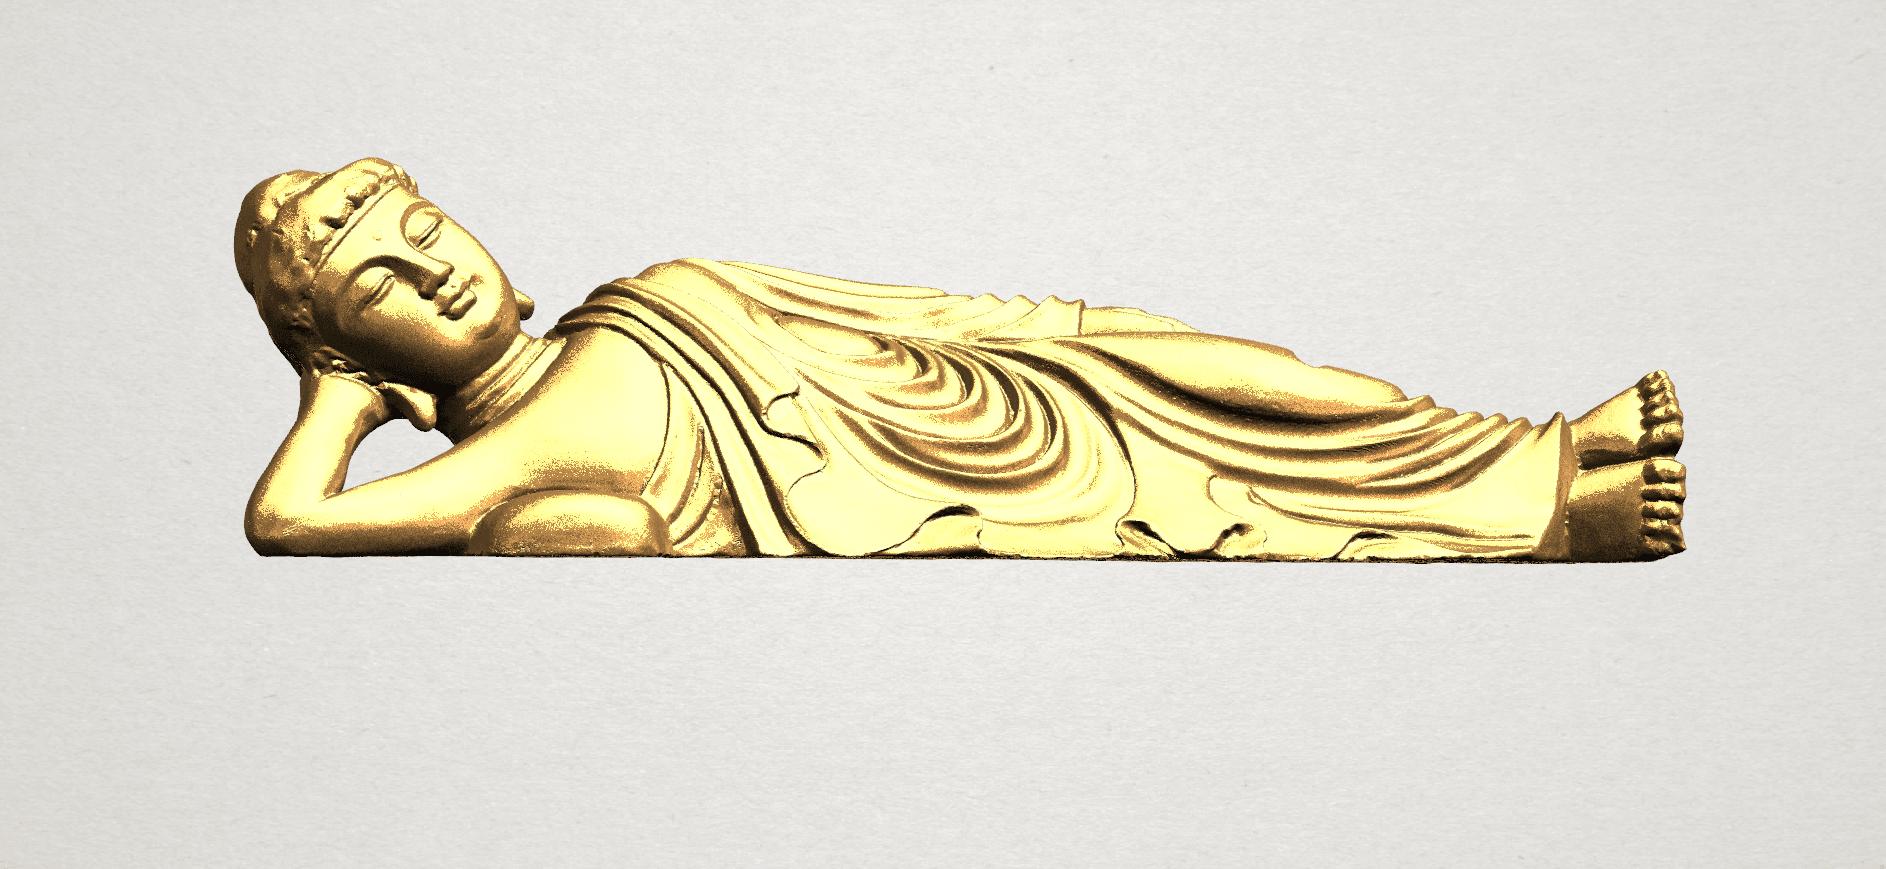 Sleeping Buddha (i) A01.png Download free STL file Sleeping Buddha 01 • 3D printable design, GeorgesNikkei